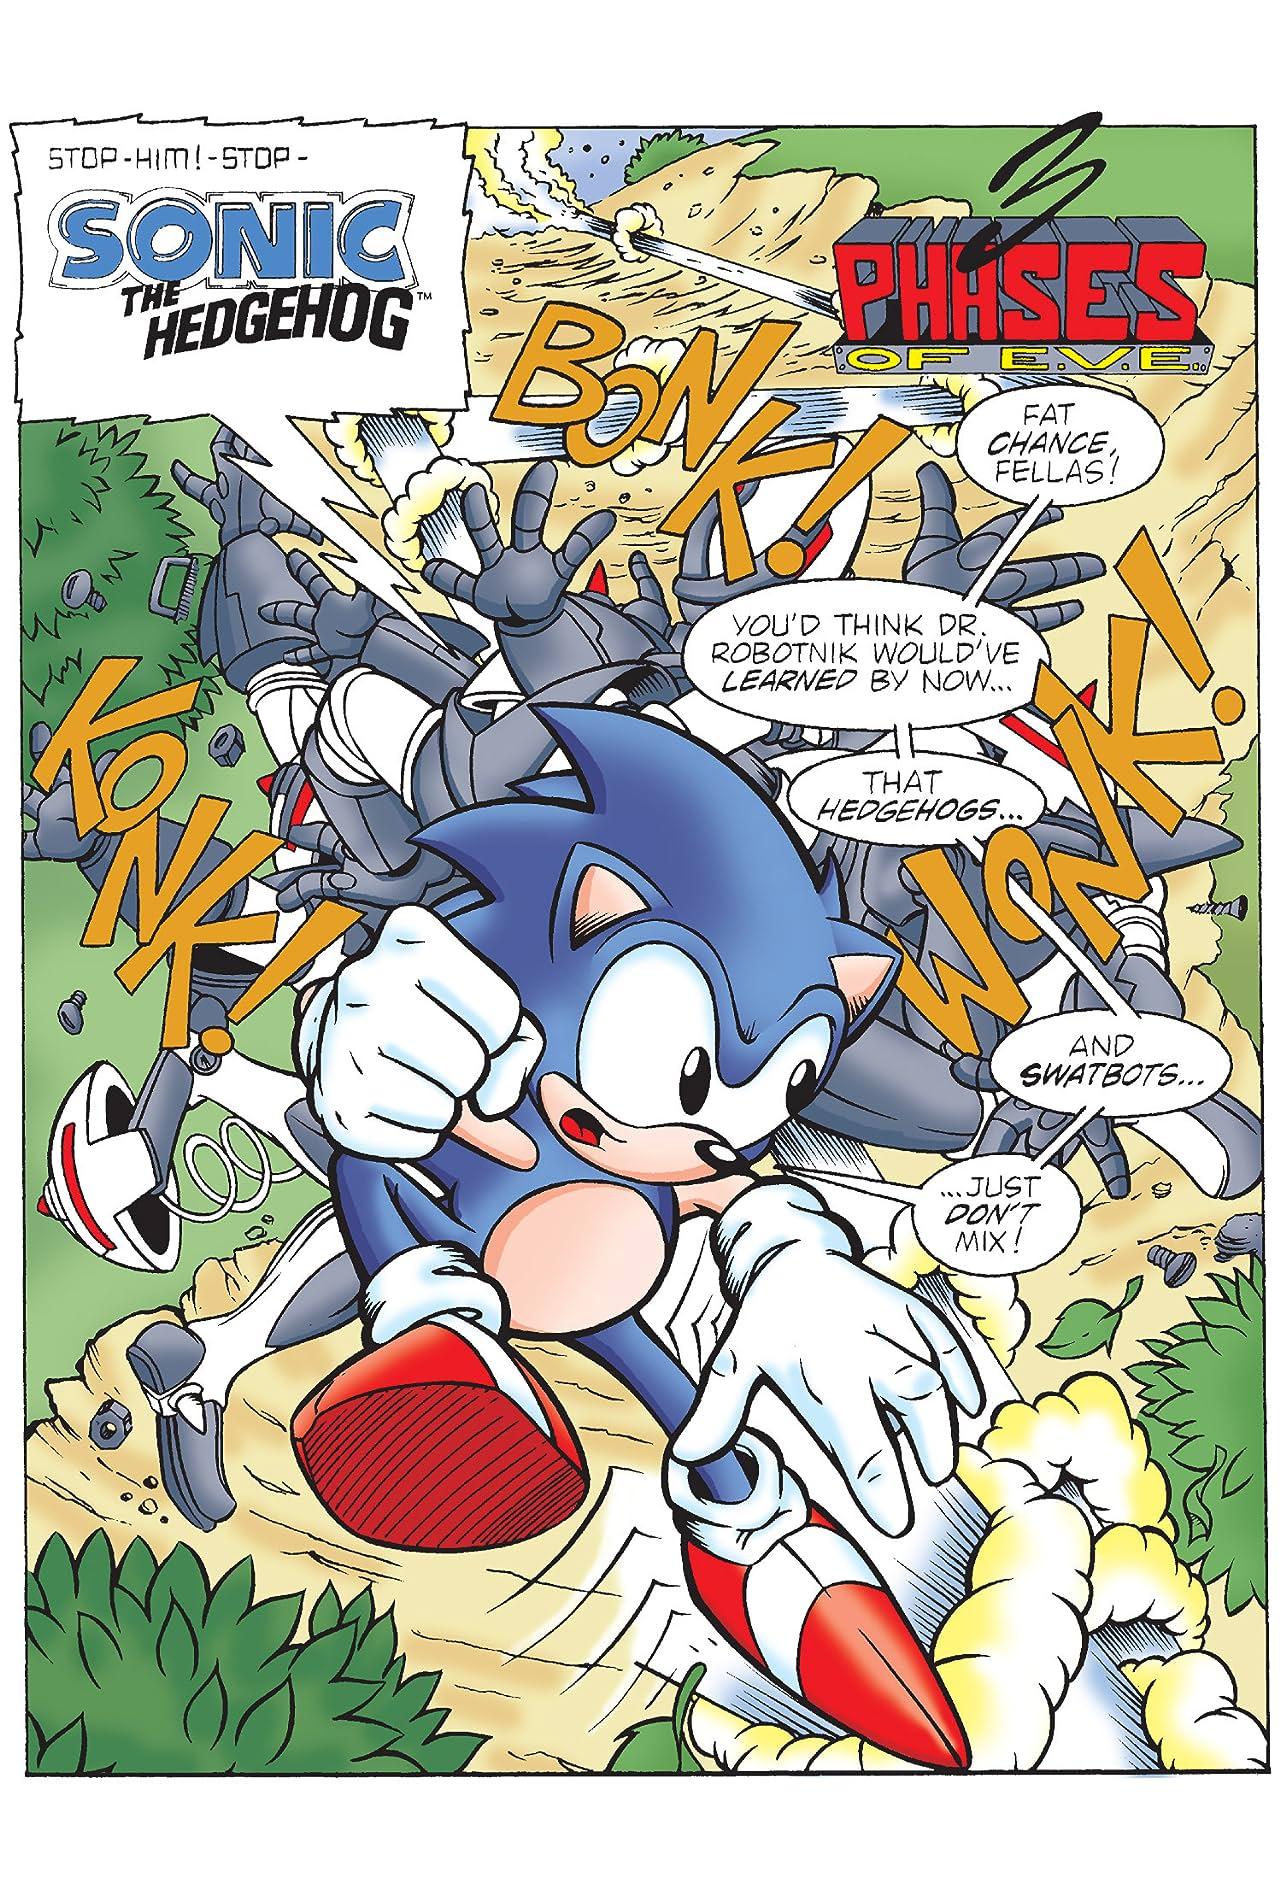 Sonic the Hedgehog #21